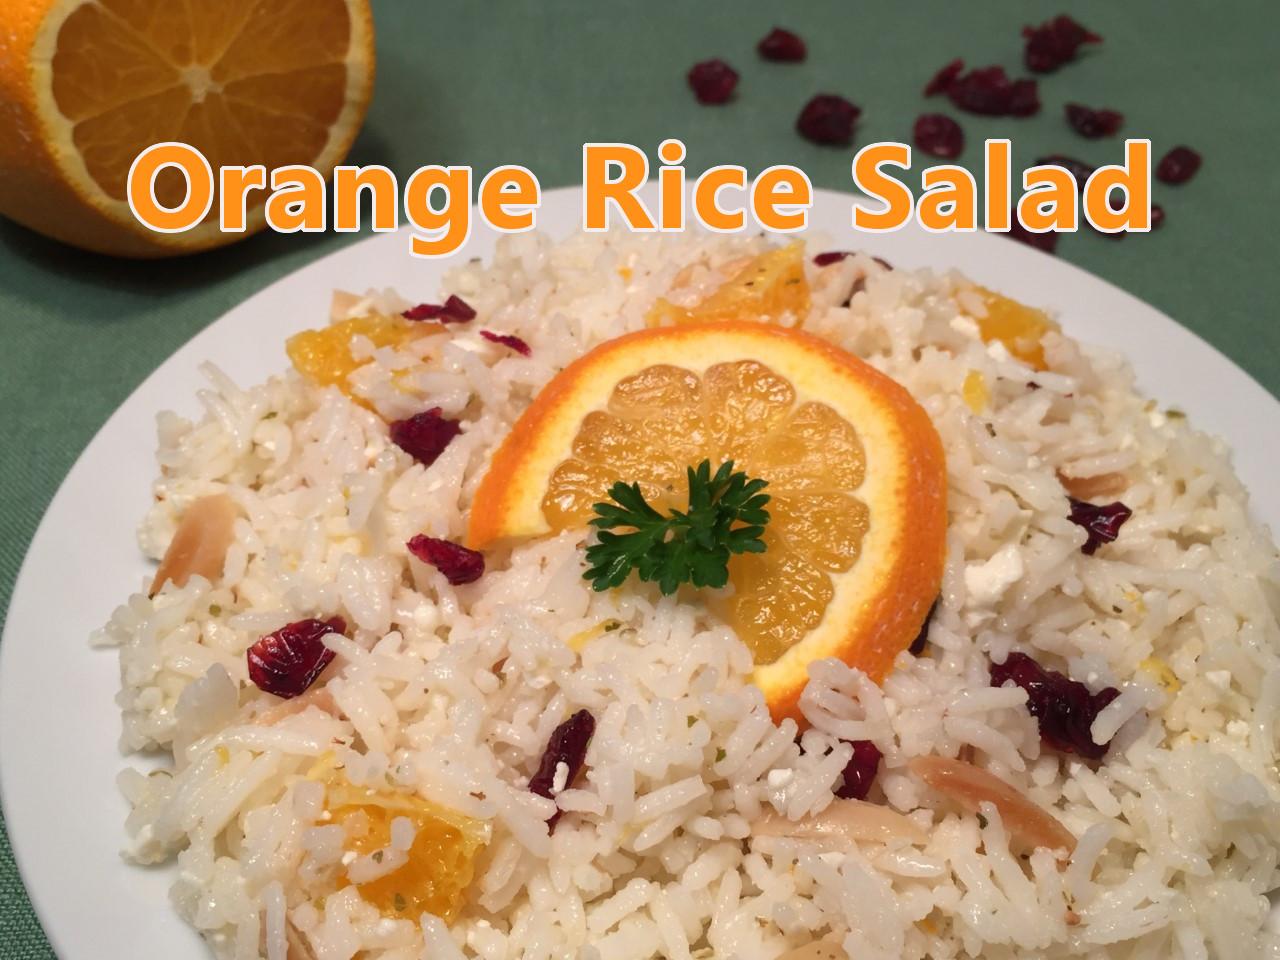 orange rice salad text